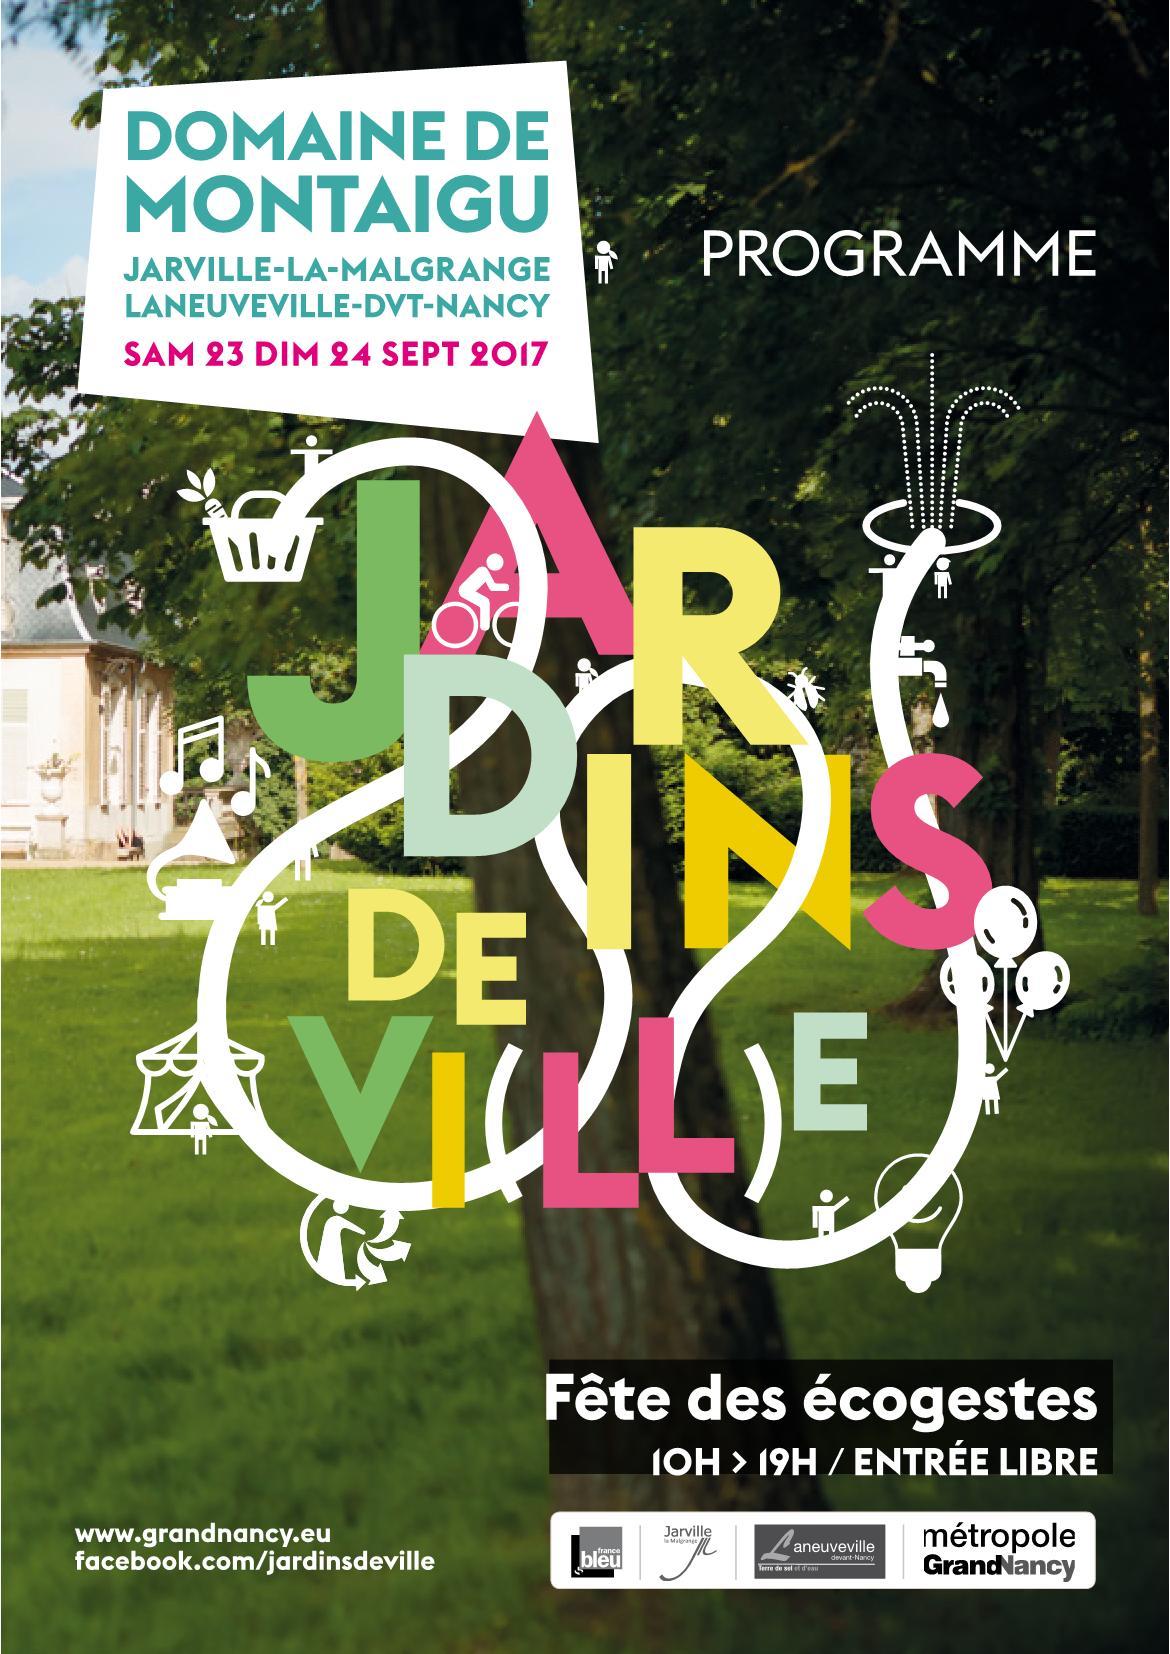 Programme Jardins de Ville, Jardins de Vie Grand Nancy 2017